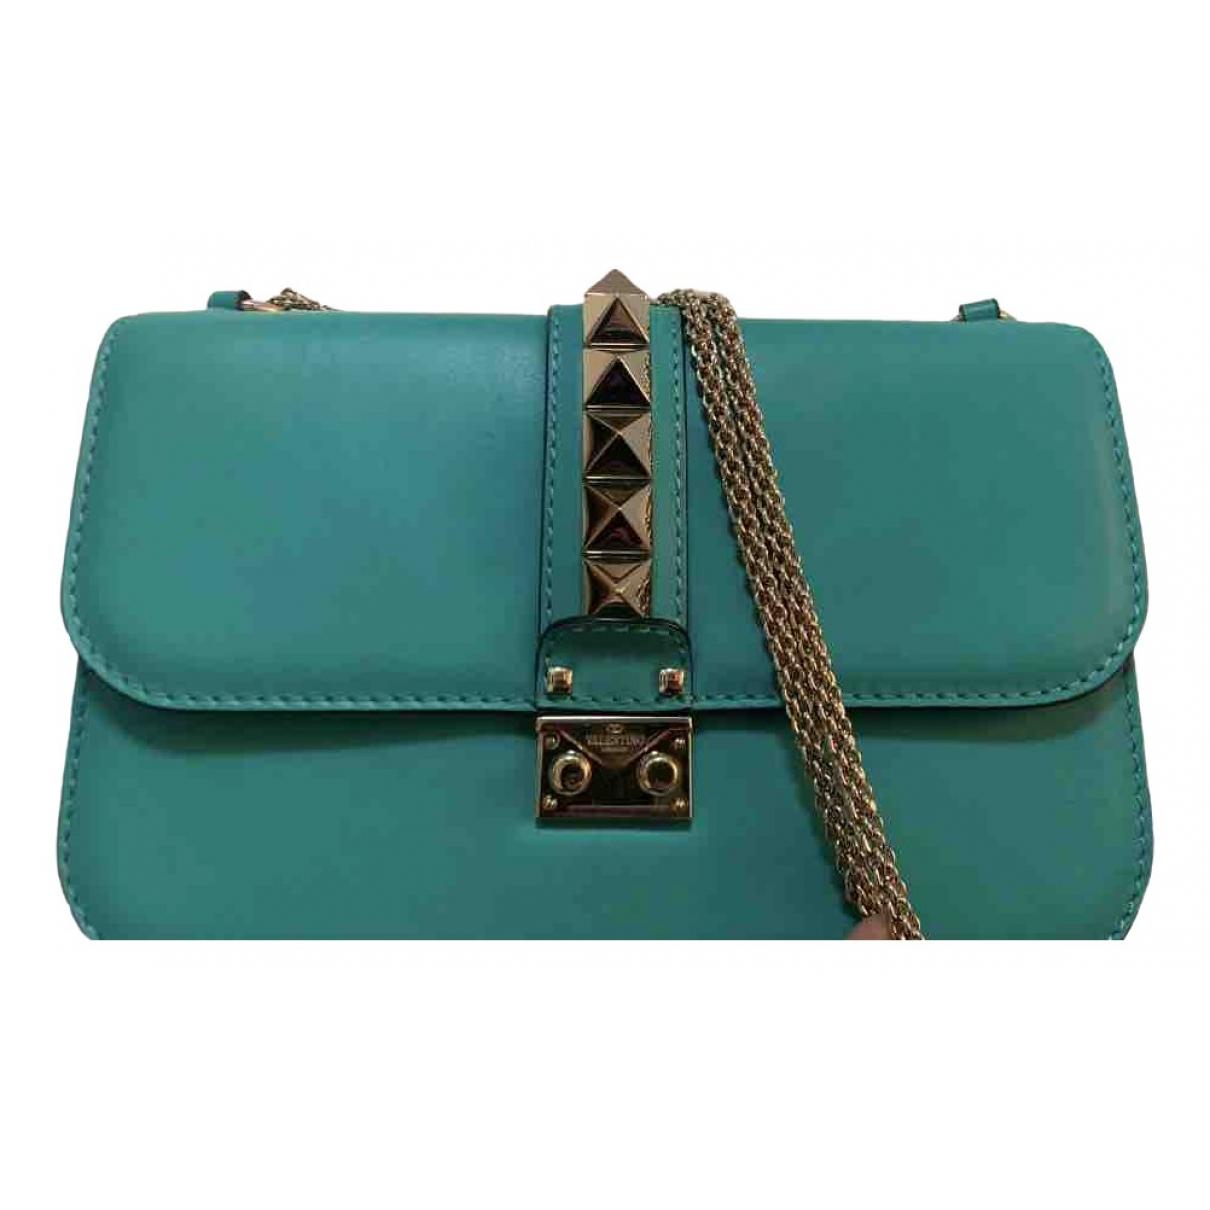 Valentino Garavani Glam Lock Green Leather handbag for Women \N